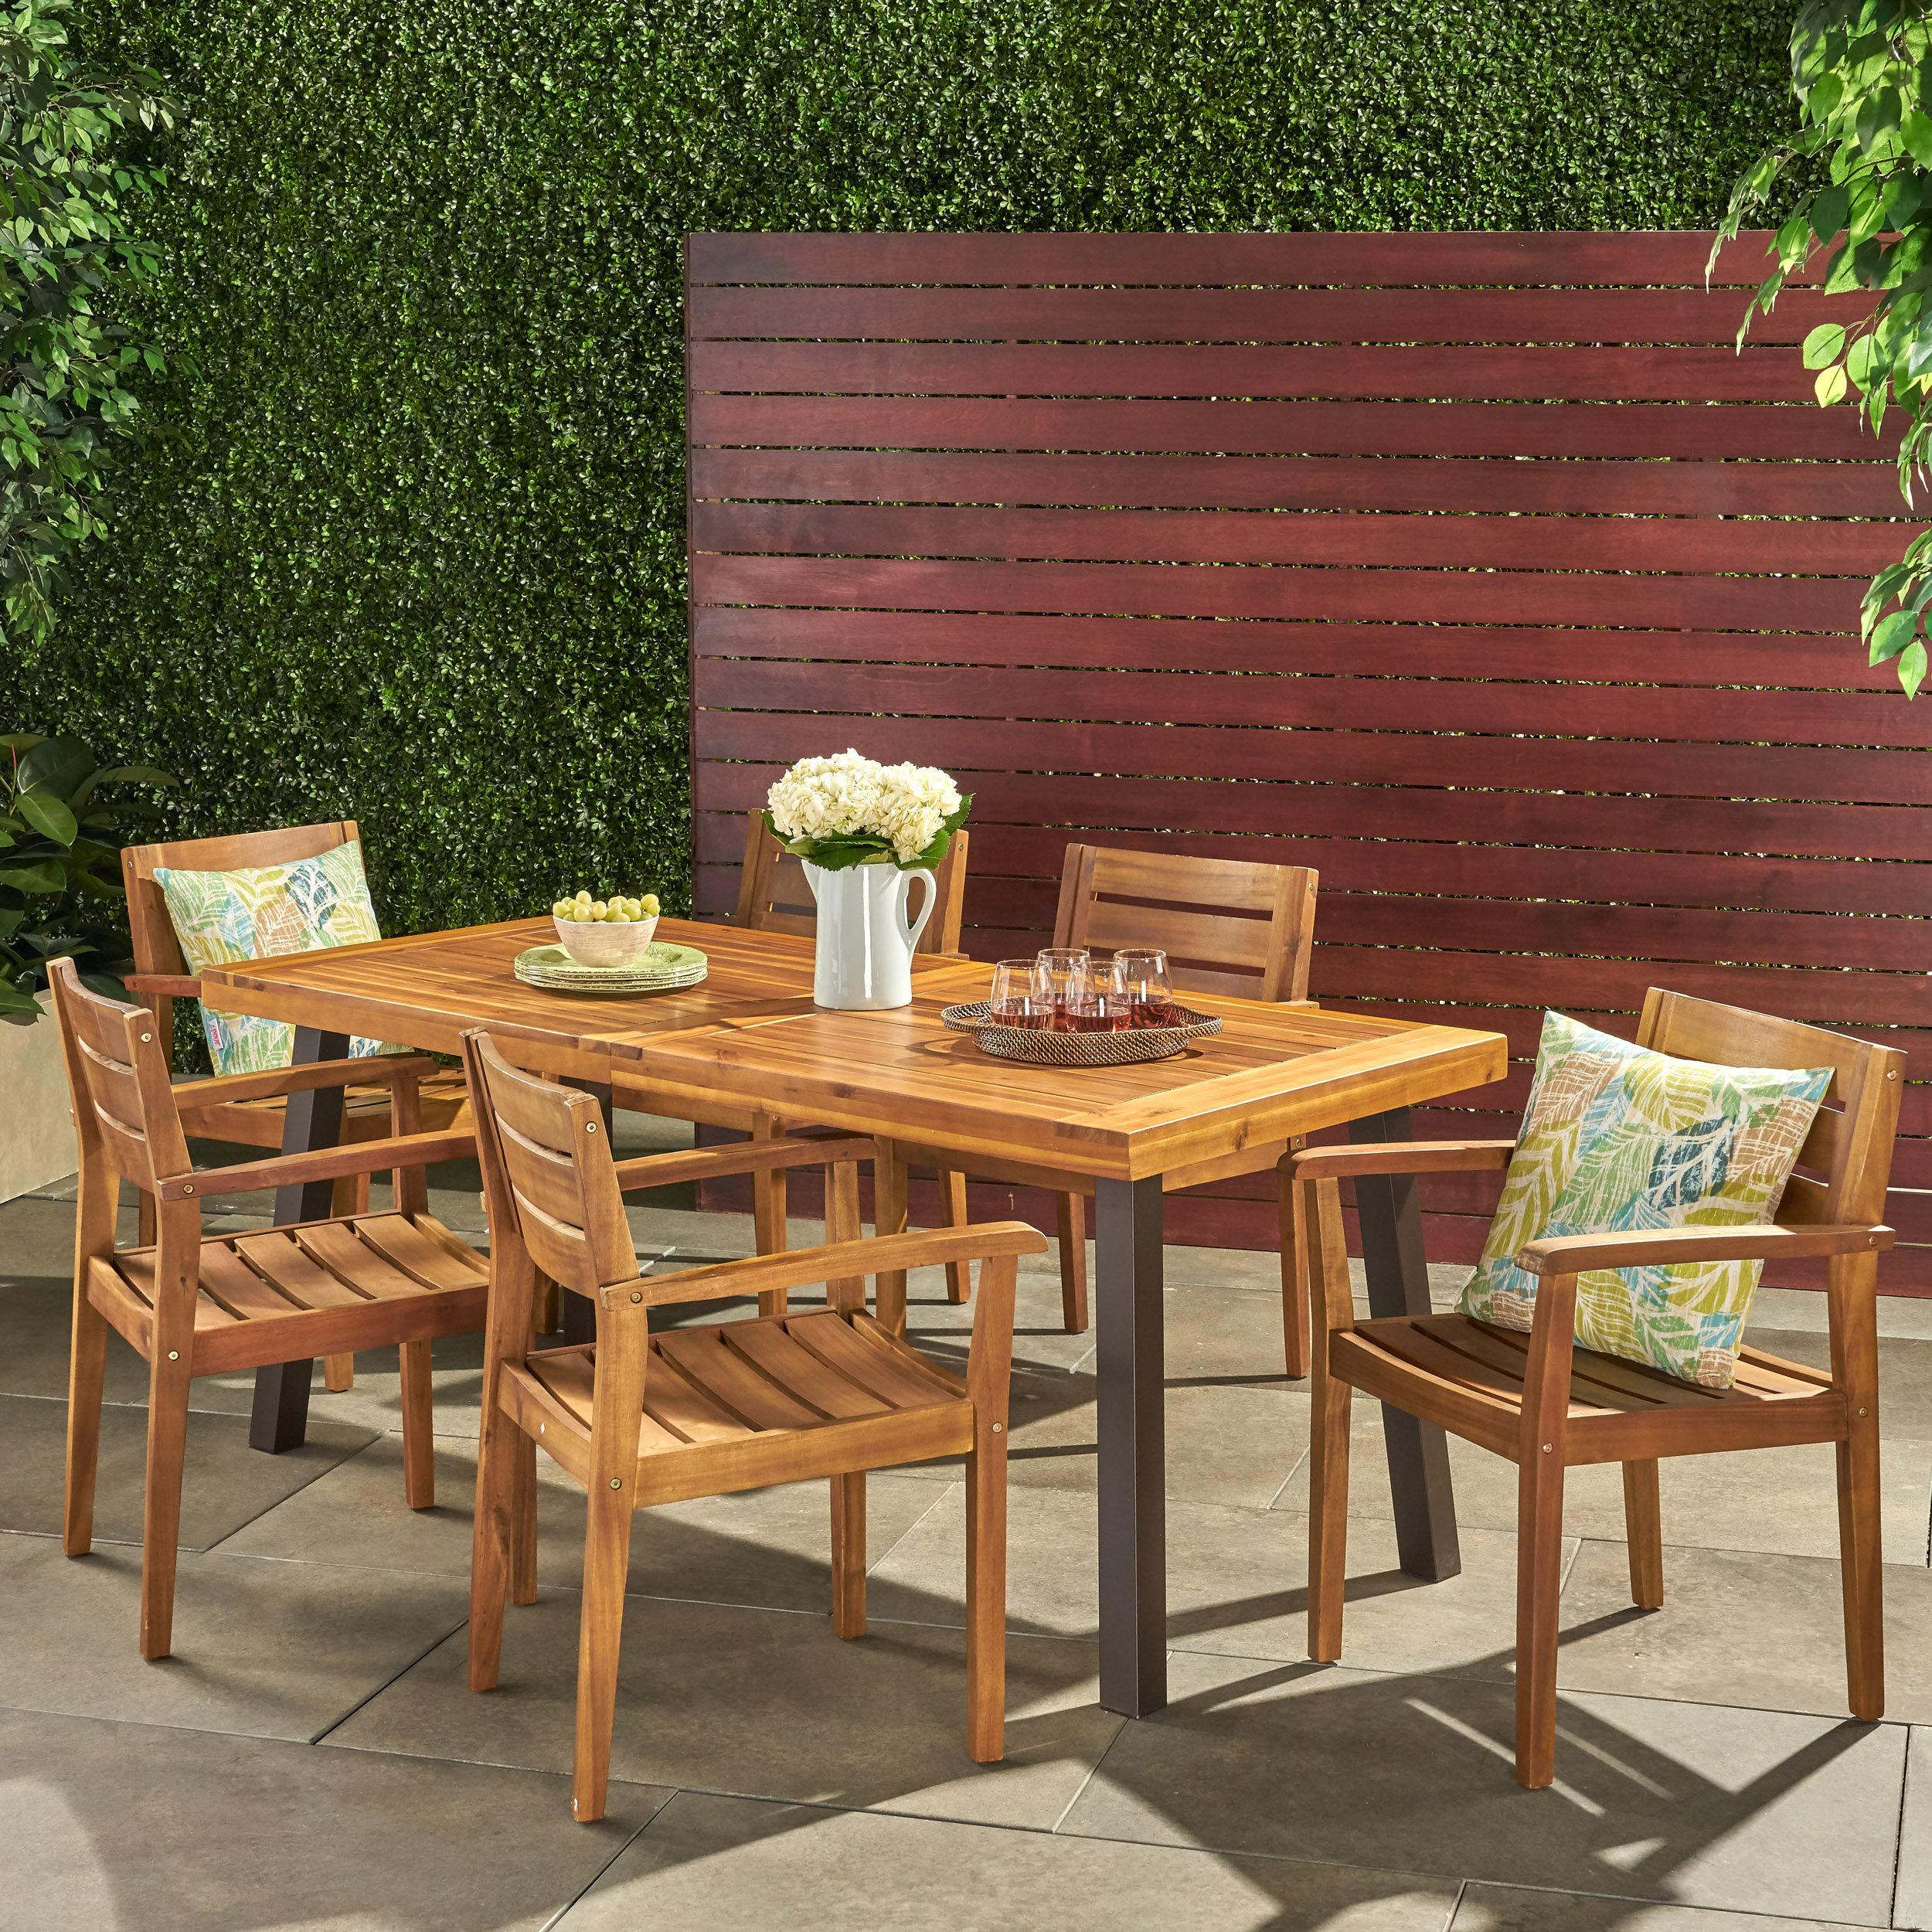 7 Piece Teak Outdoor Dining Set